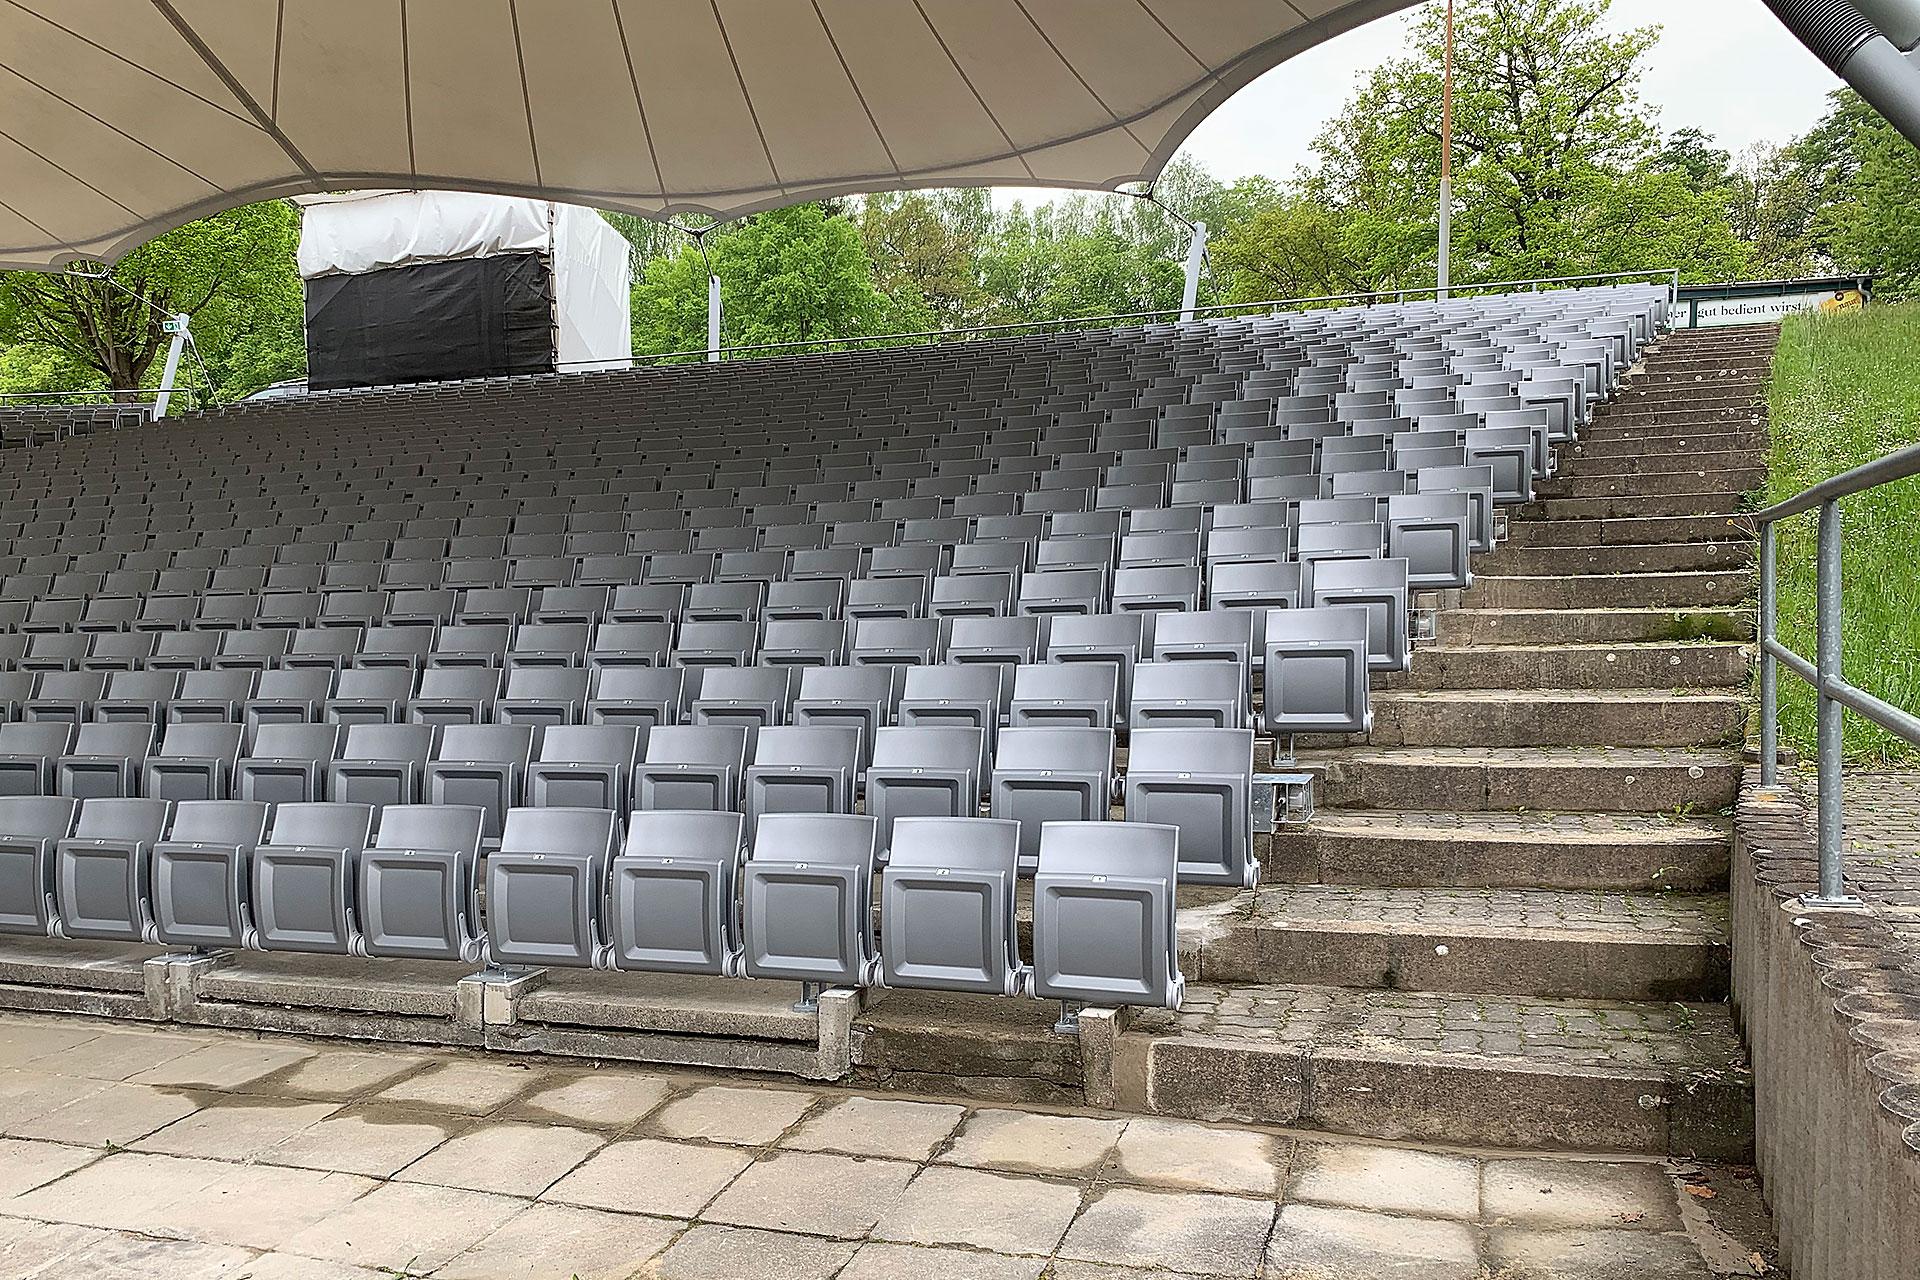 DE-Plauen-Parktheater-01-web1